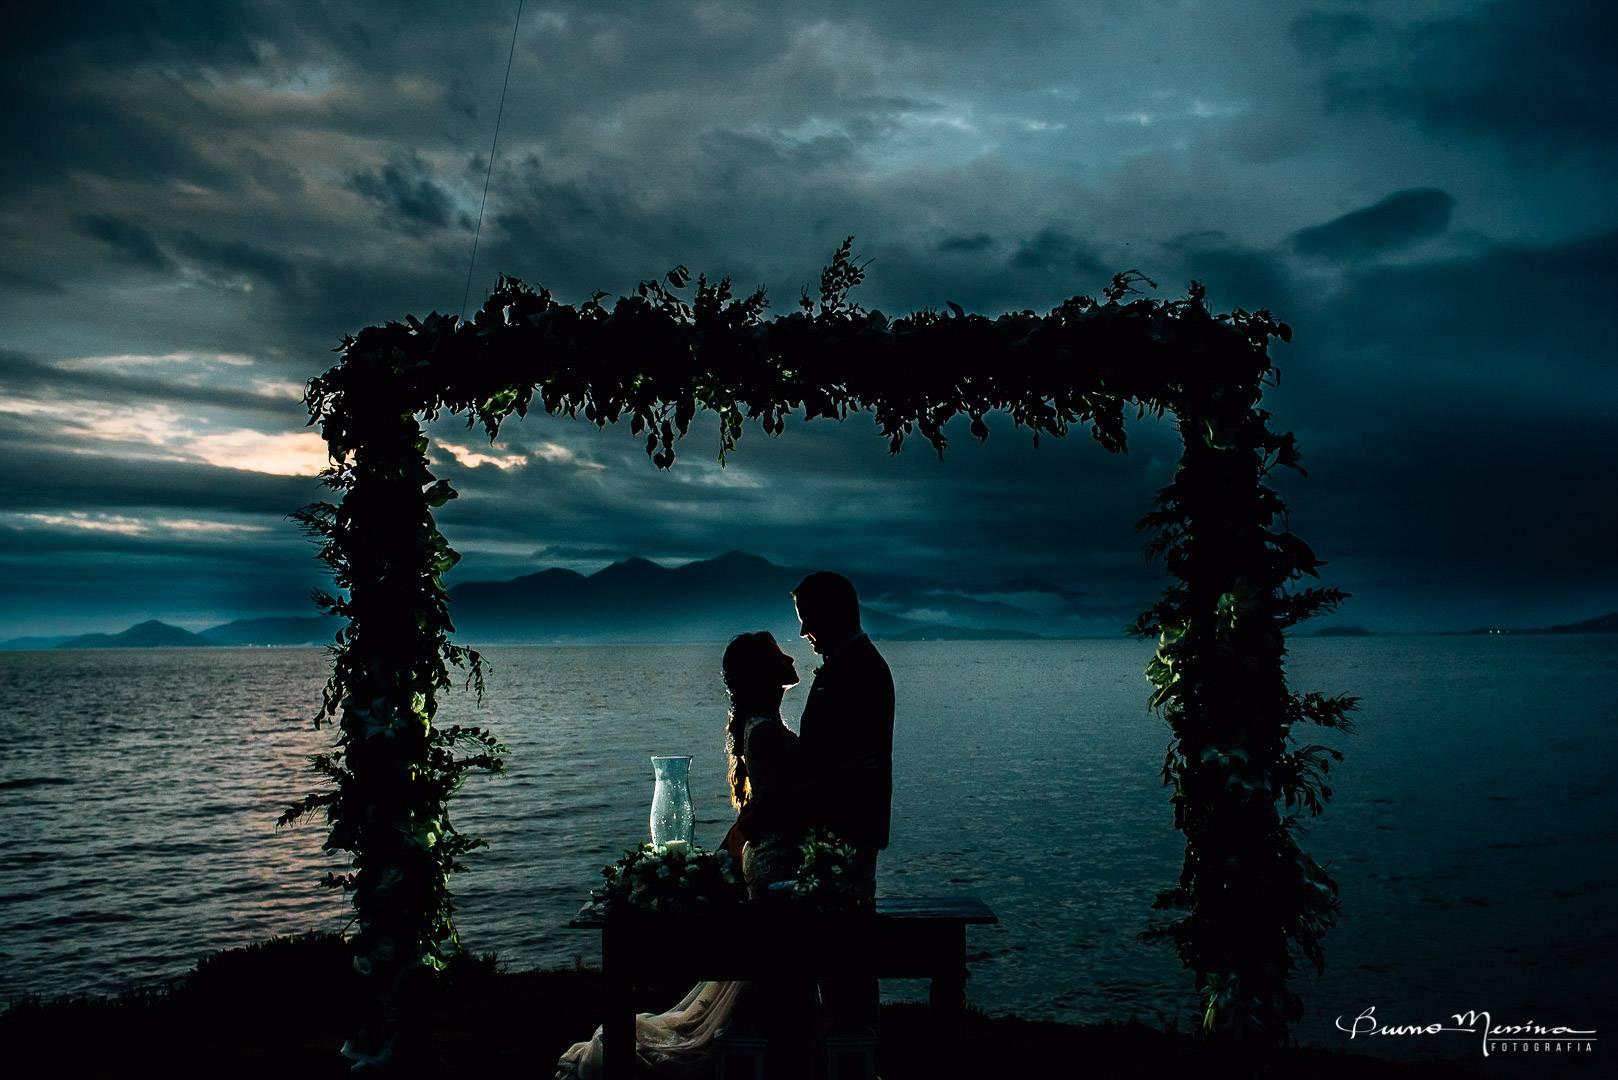 casamento-ao-ar-livre-casamento-na-praia-fotos-casamento-de-dia63